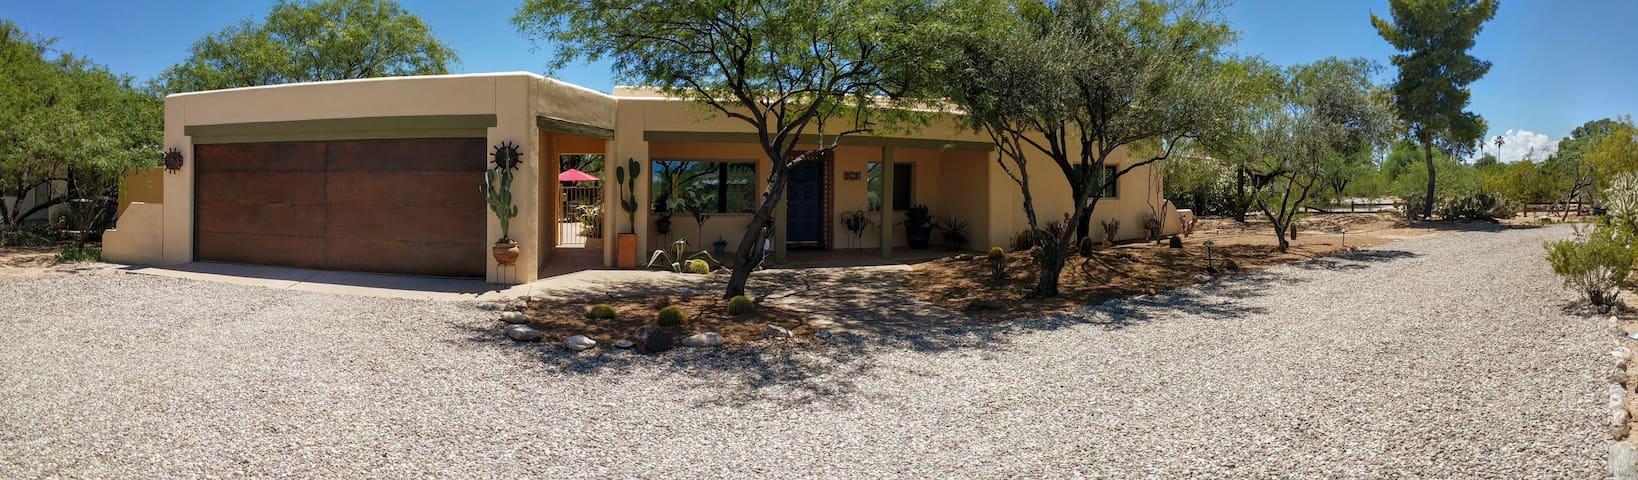 Classic Southwestern Gem in Tucson